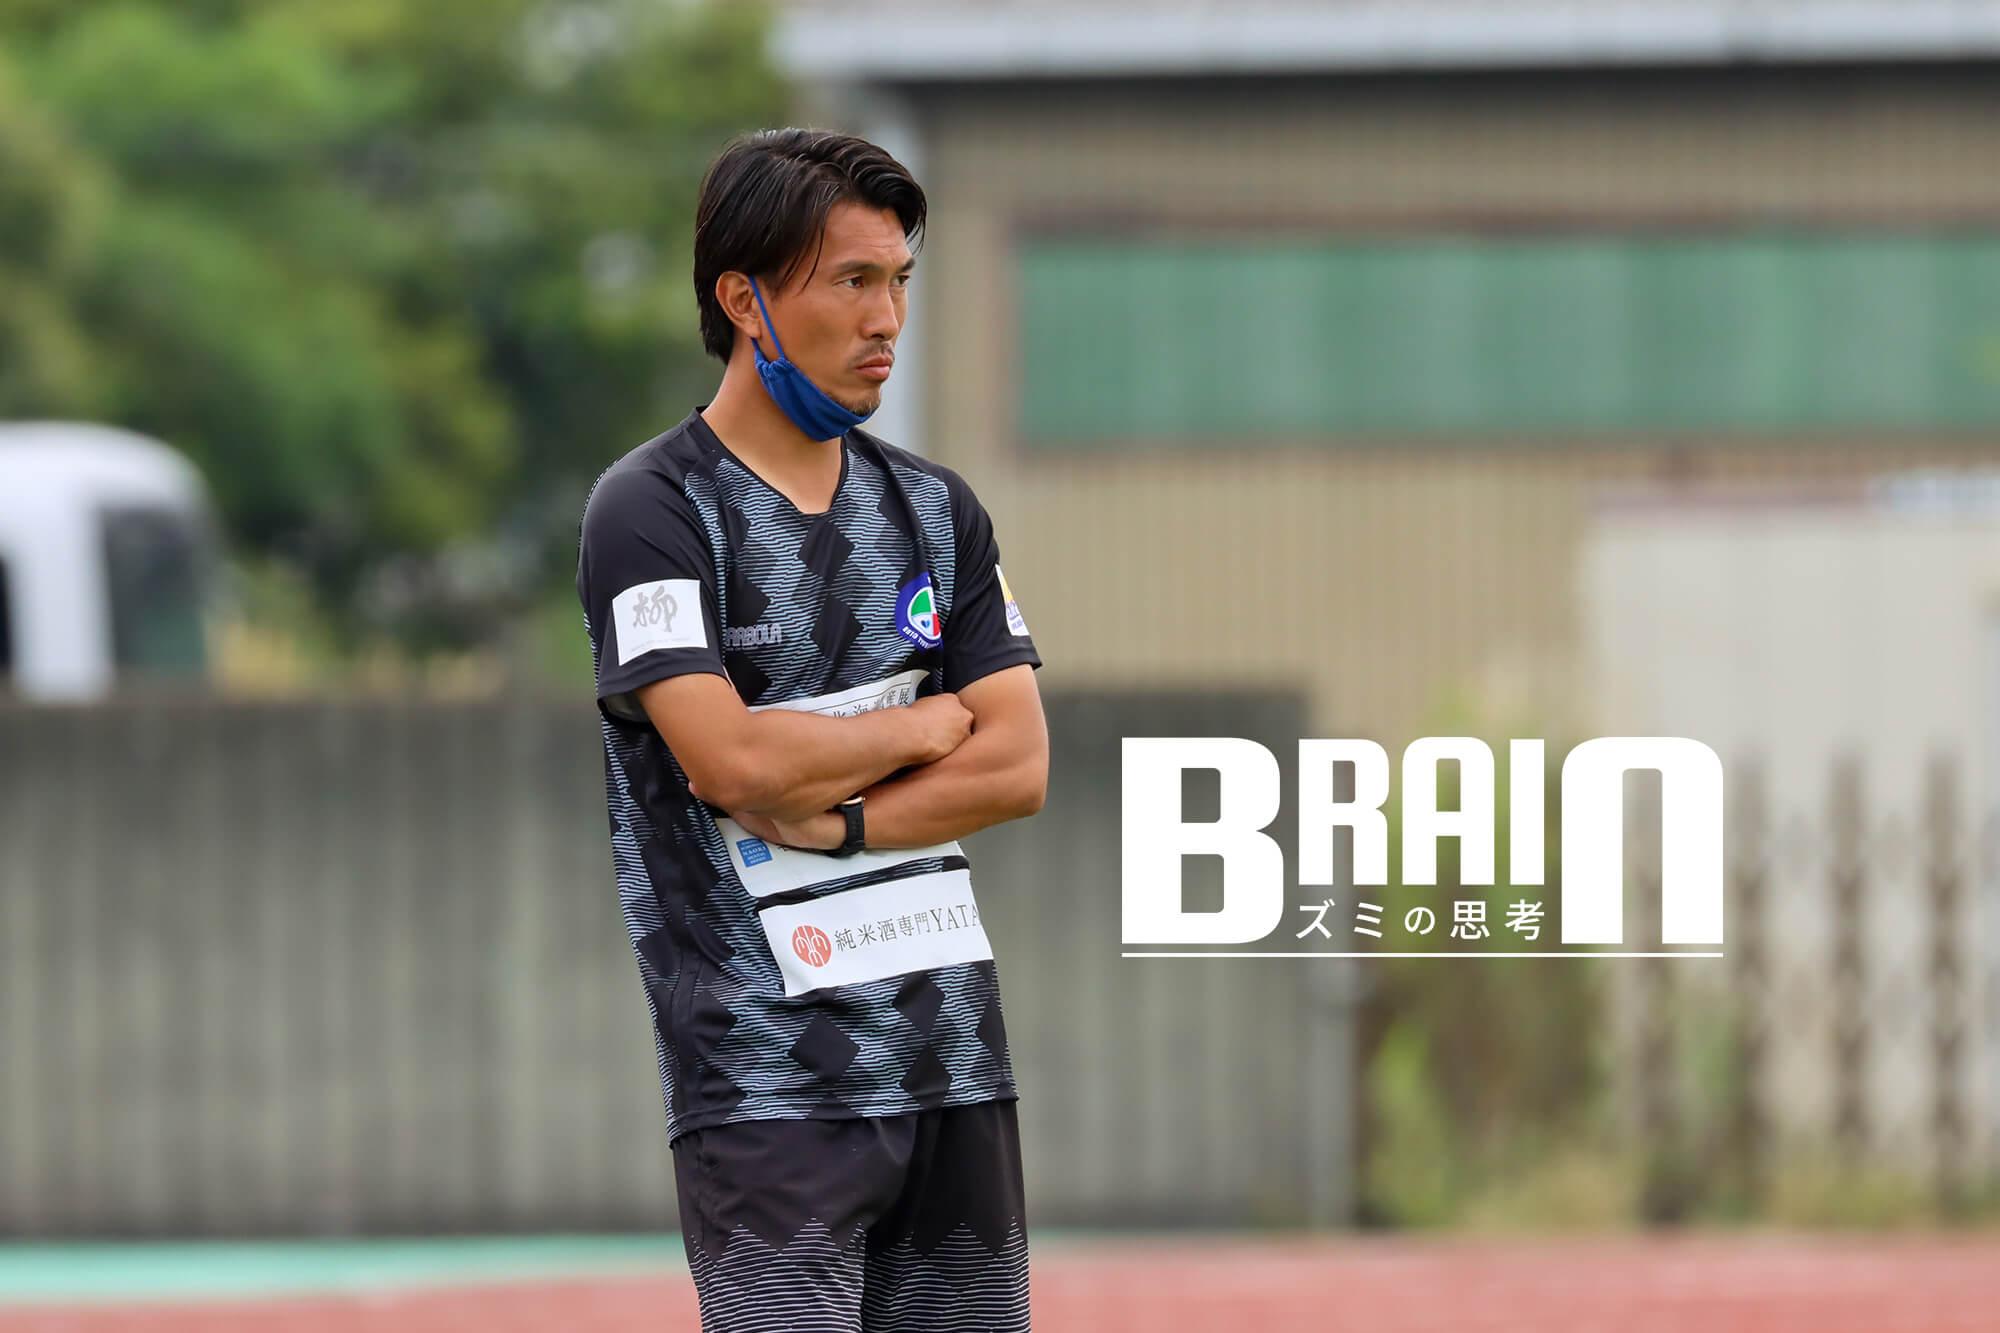 Vol.13 関西サッカーリーグDivision1、優勝!